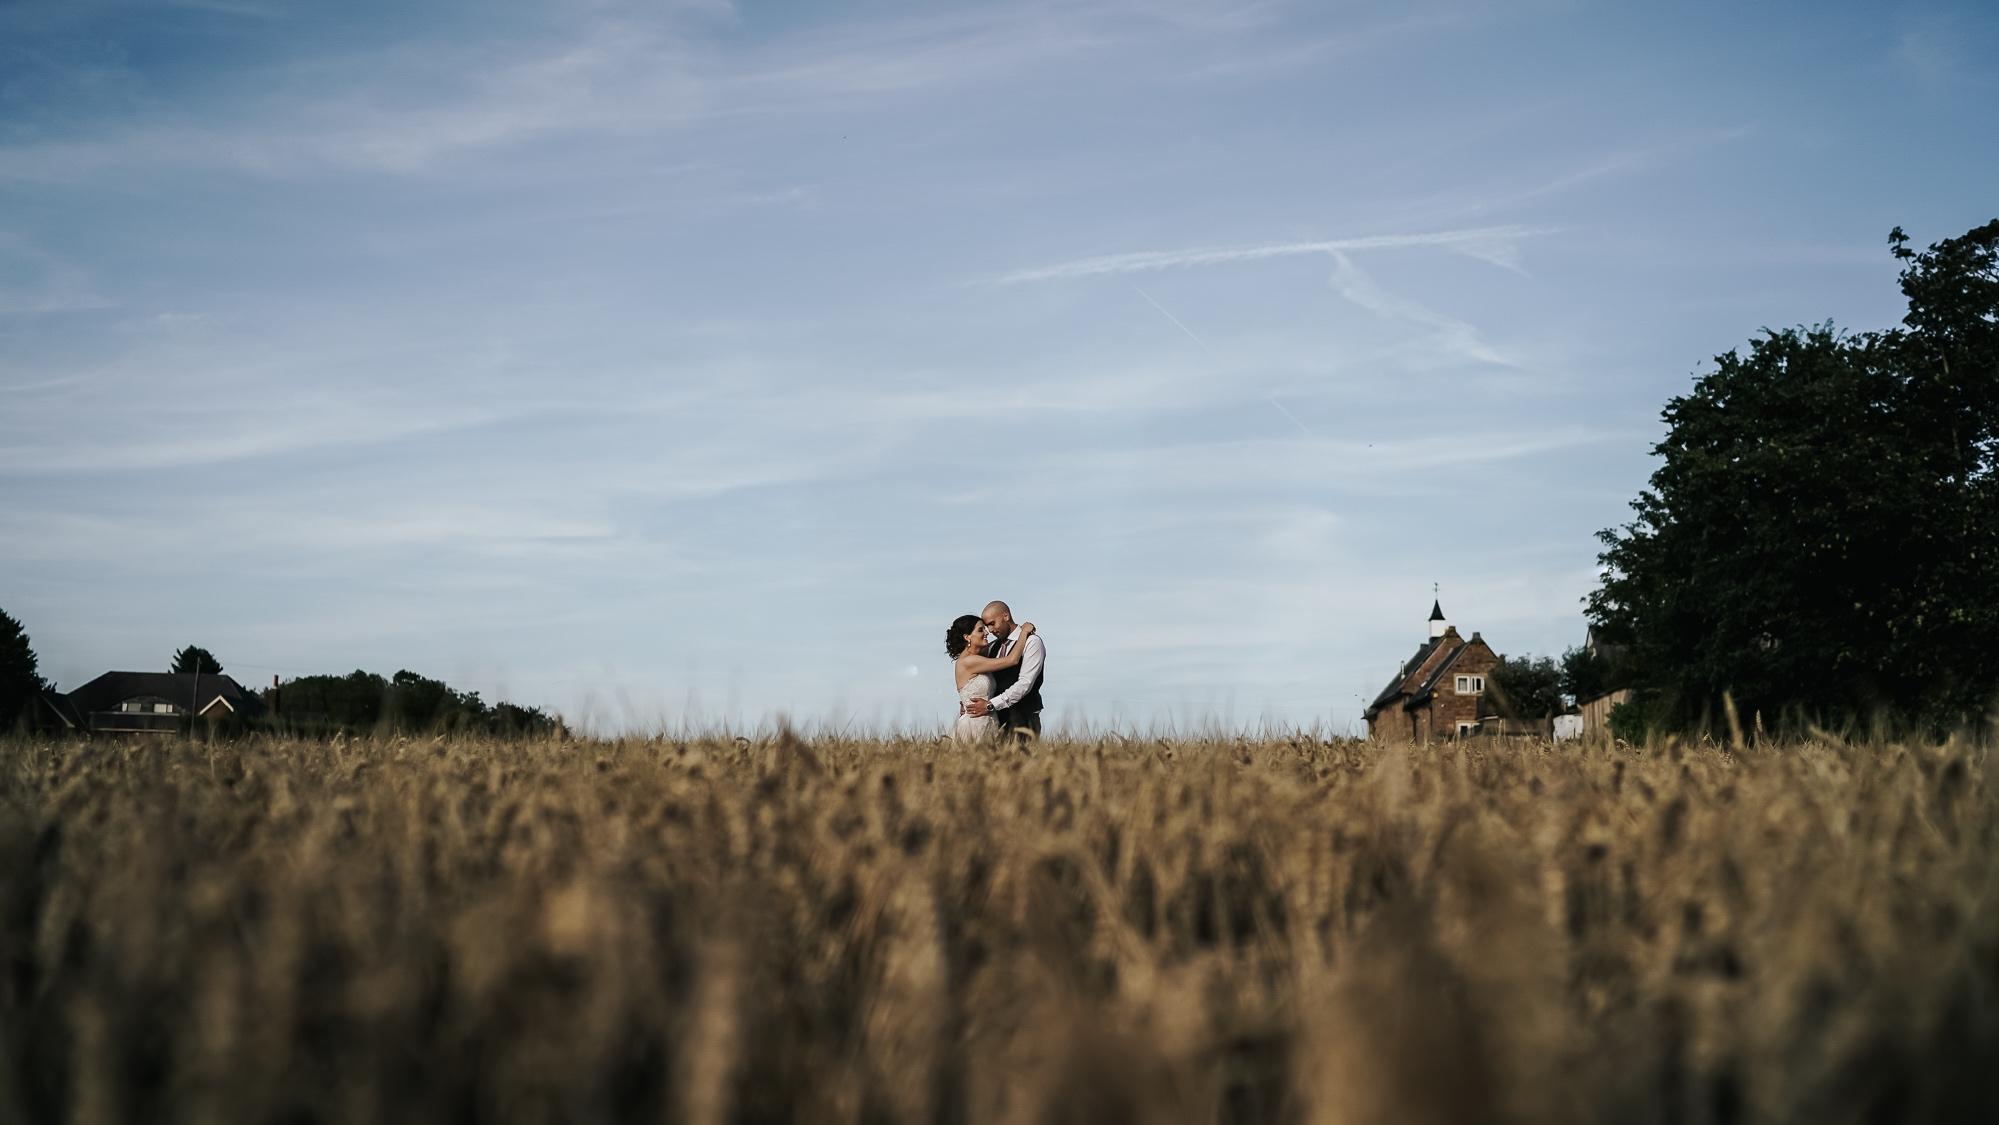 West+Tower+Wedding+Venue+Orkskirk+Lancashire+Wedding+Photography+cheshire+wedding+photographer+%2844+of+47%29.jpg